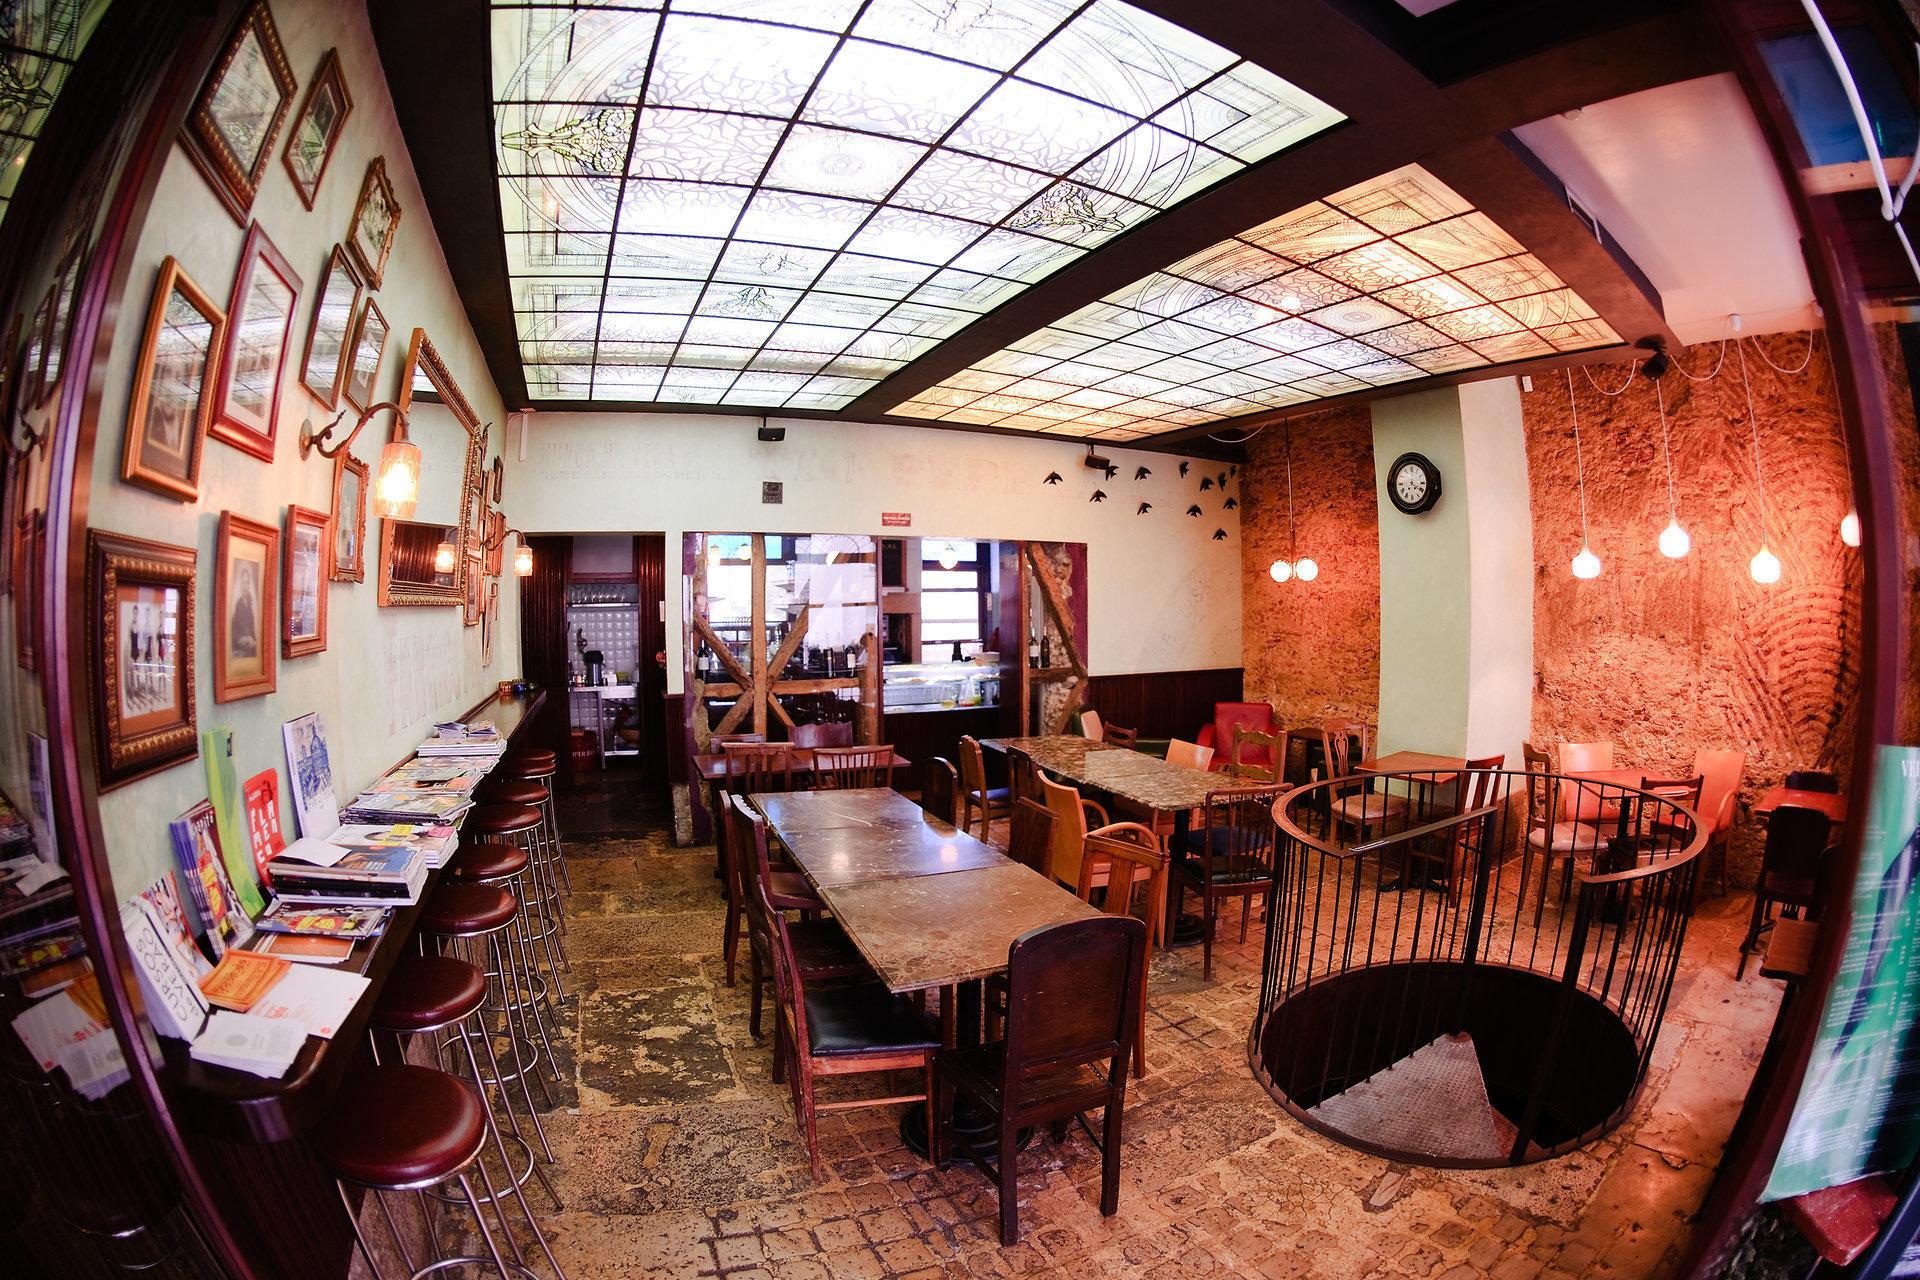 Vertigo Café: A Work-Friendly Place in Lisbon